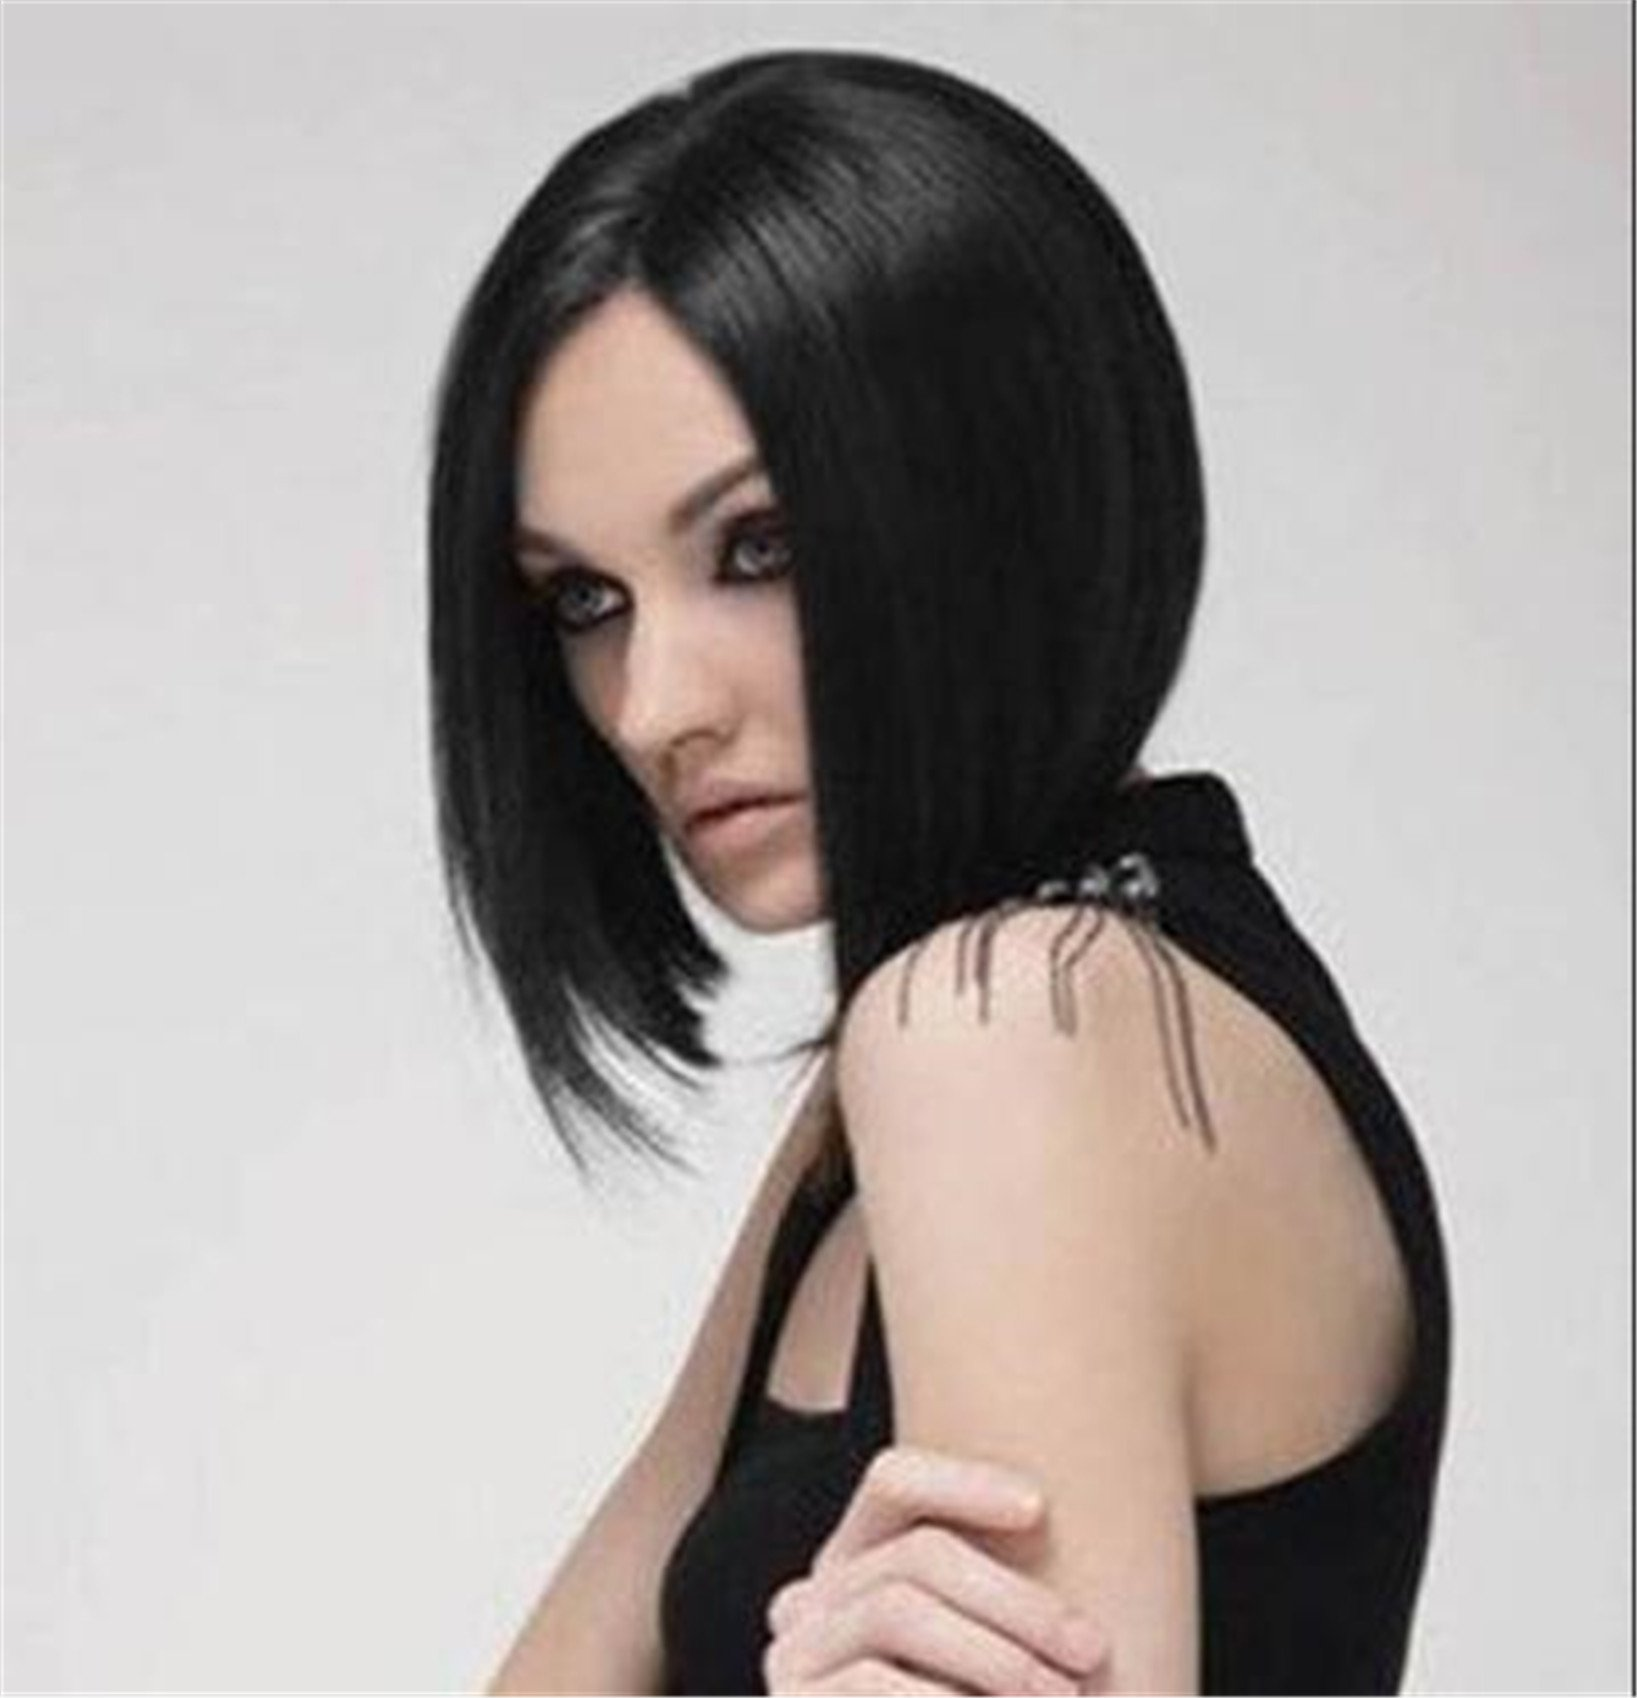 Amazon.com: Unisex Stocking Wig Cap Snood Mesh Black: Arts ...